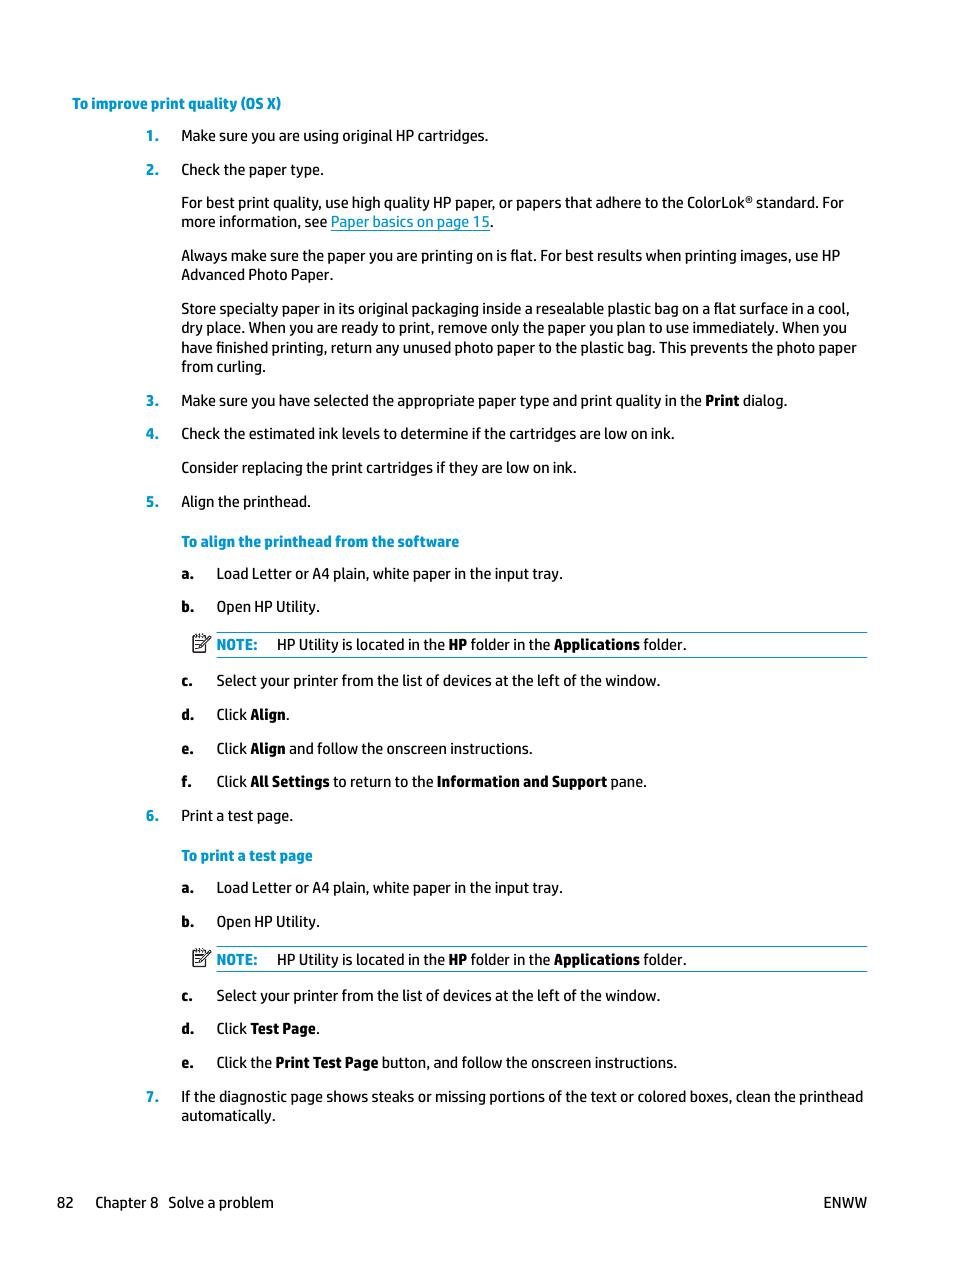 HP DeskJet 3700 User Manual | Page 86 / 118